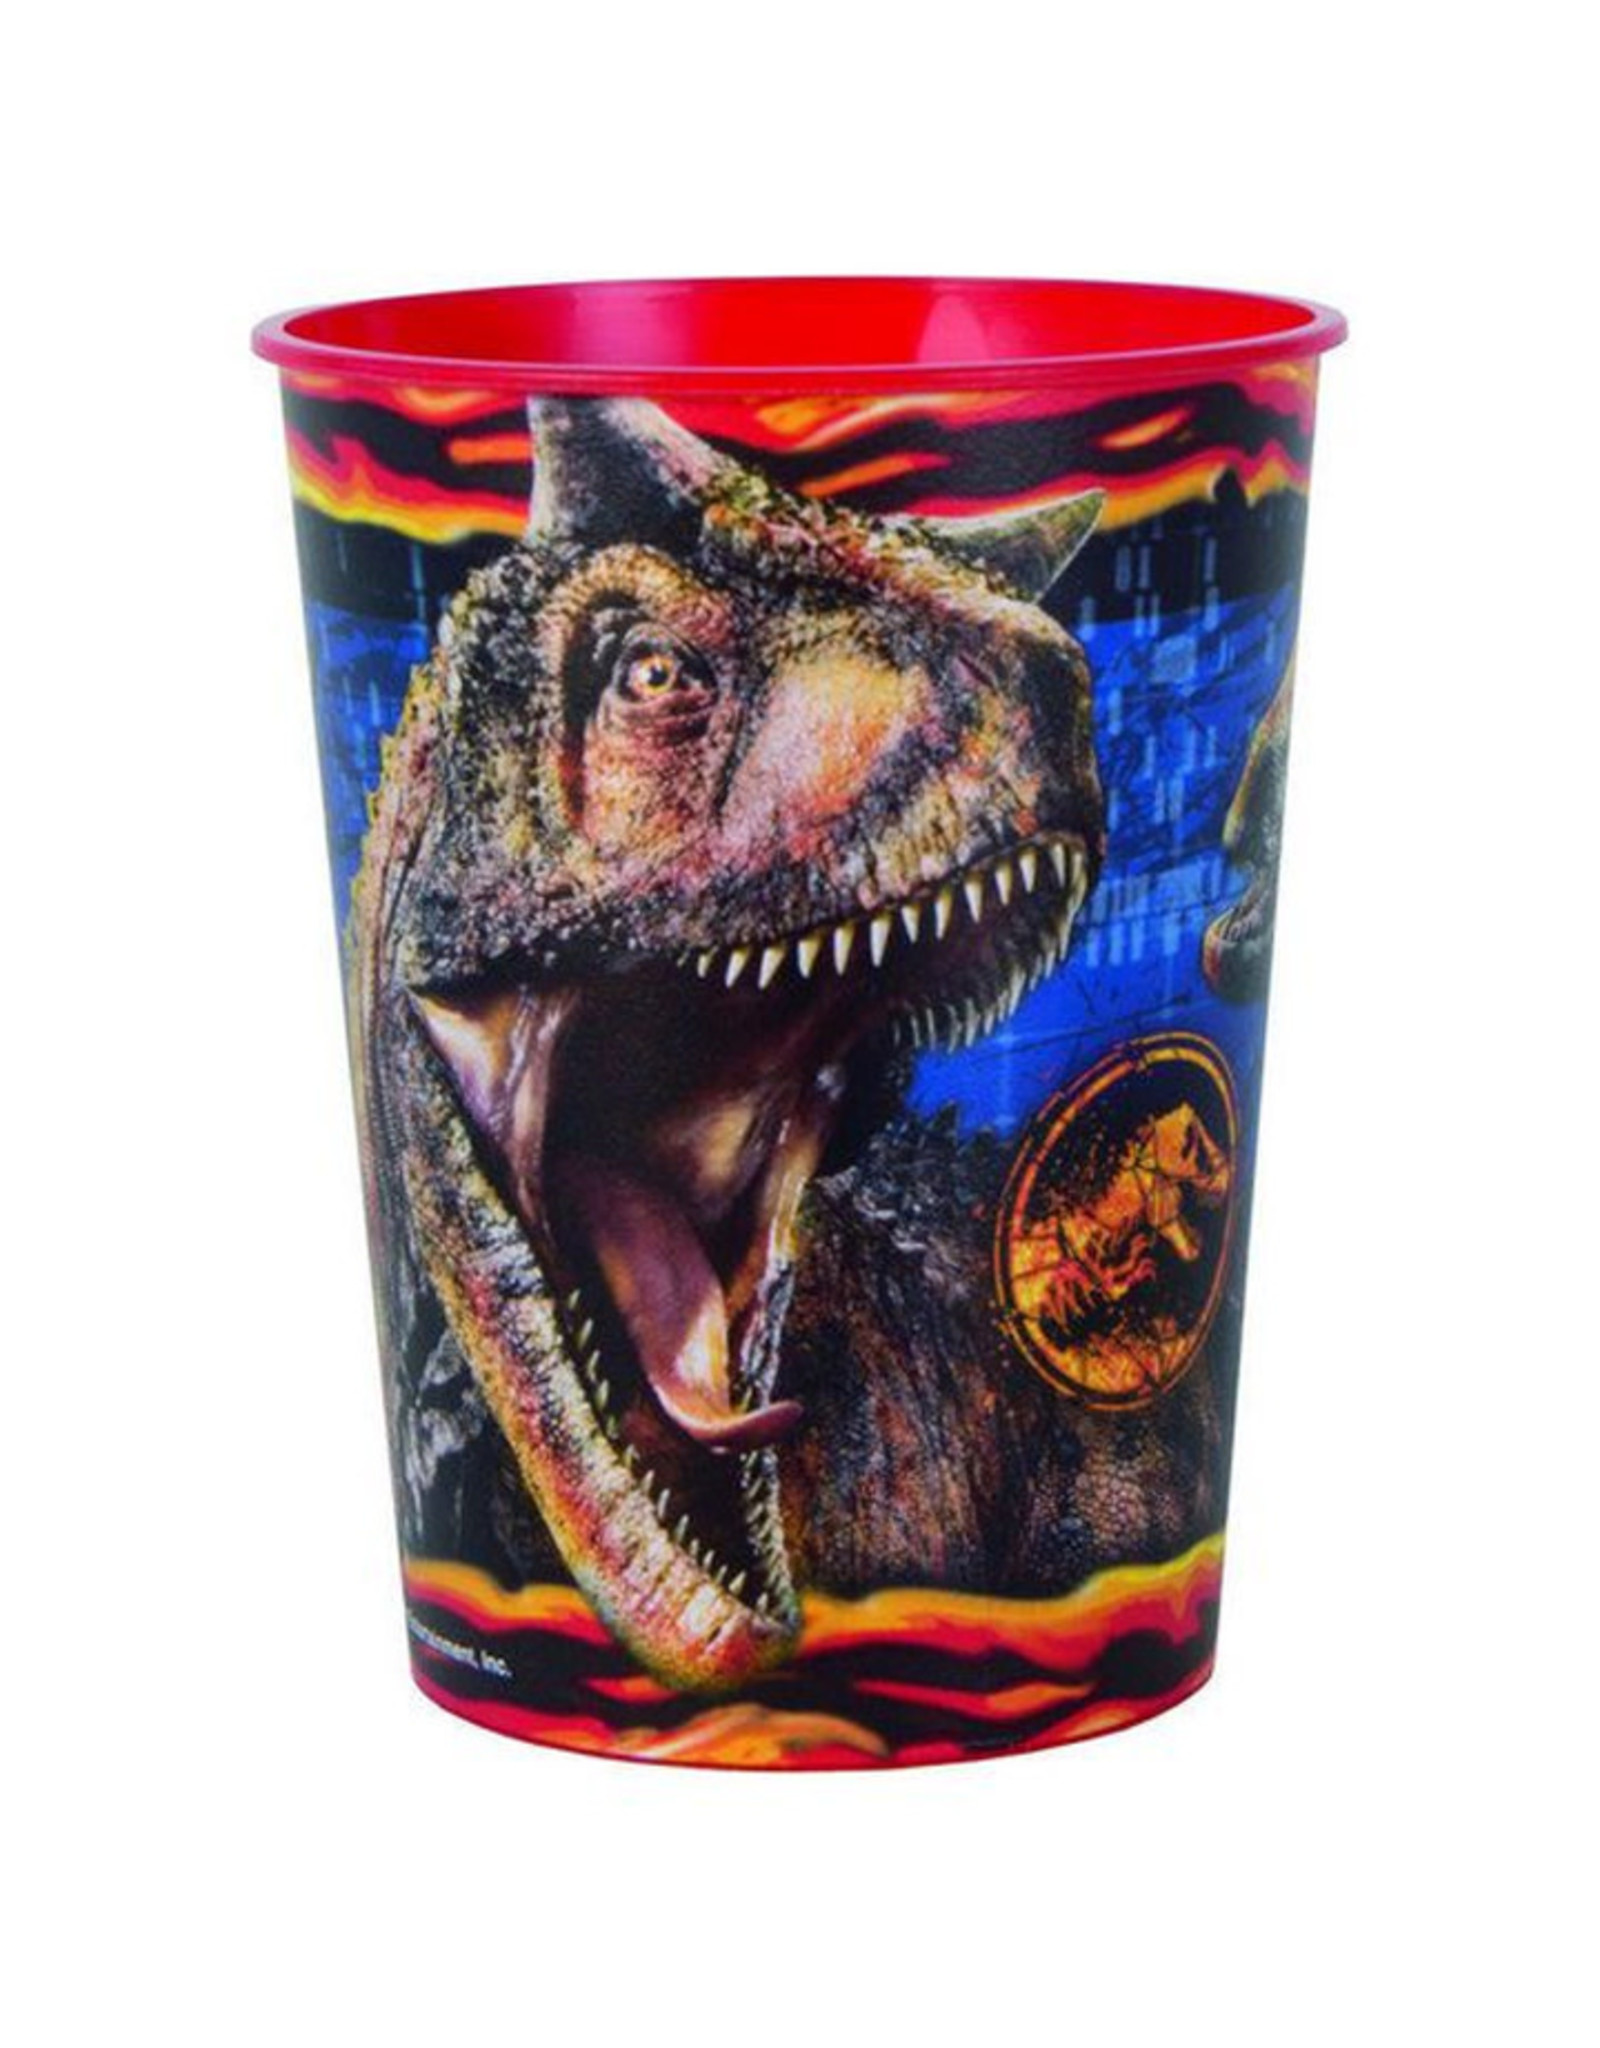 UNIQUE INDUSTRIES INC Jurassic World: Fallen Kingdom 16oz Plastic Favor Cup